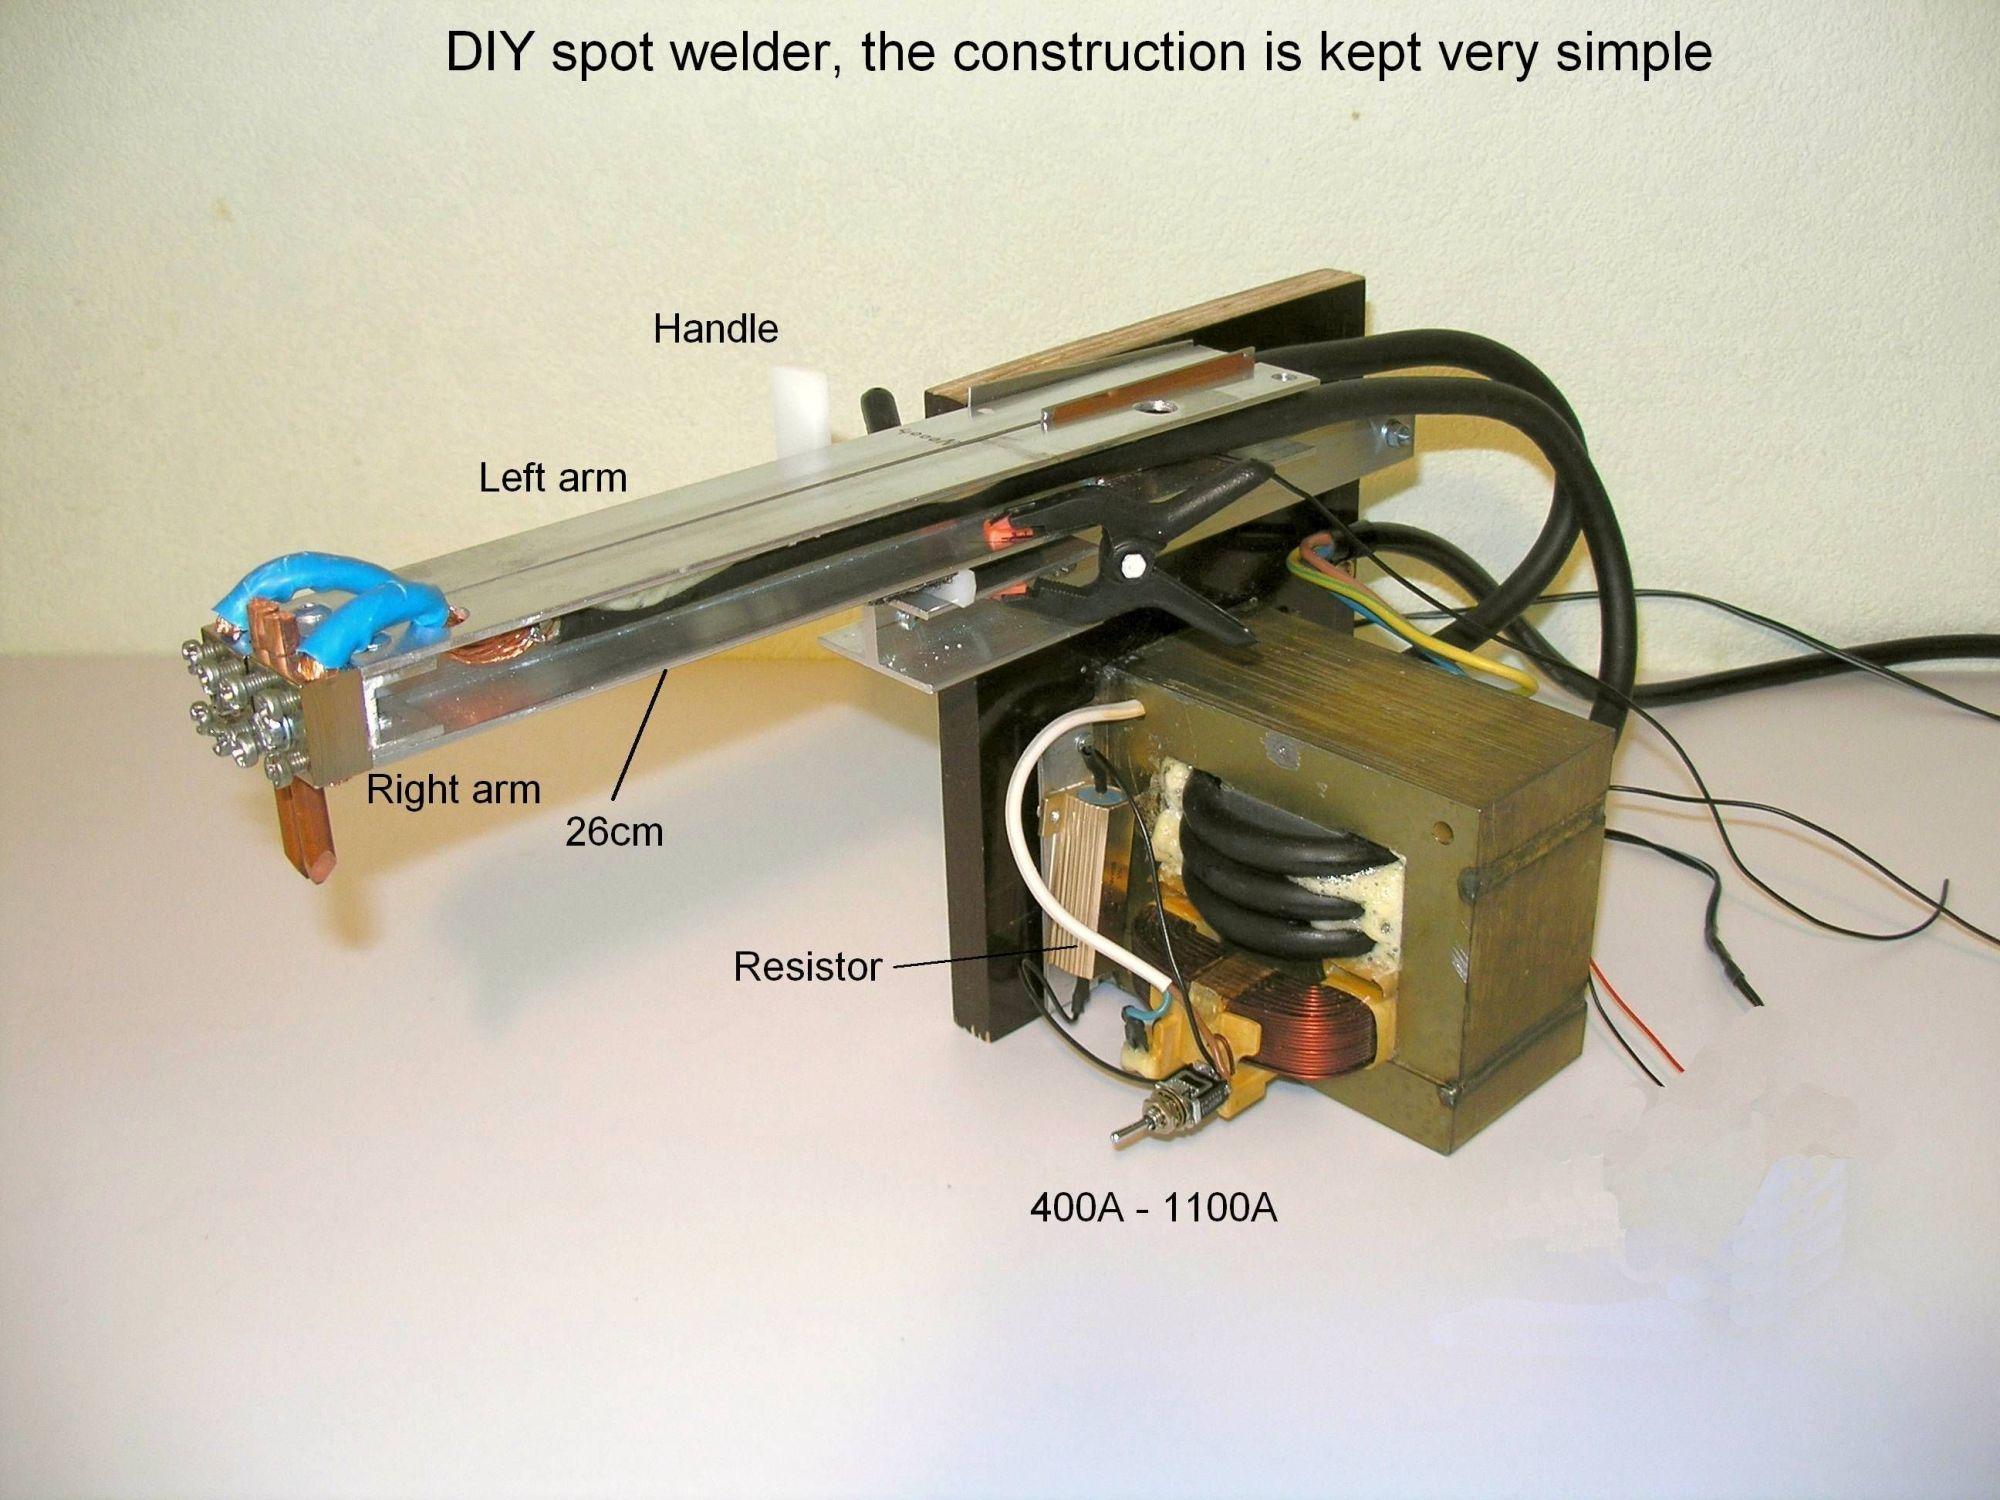 hight resolution of diy battery tab resistance fine spot welder